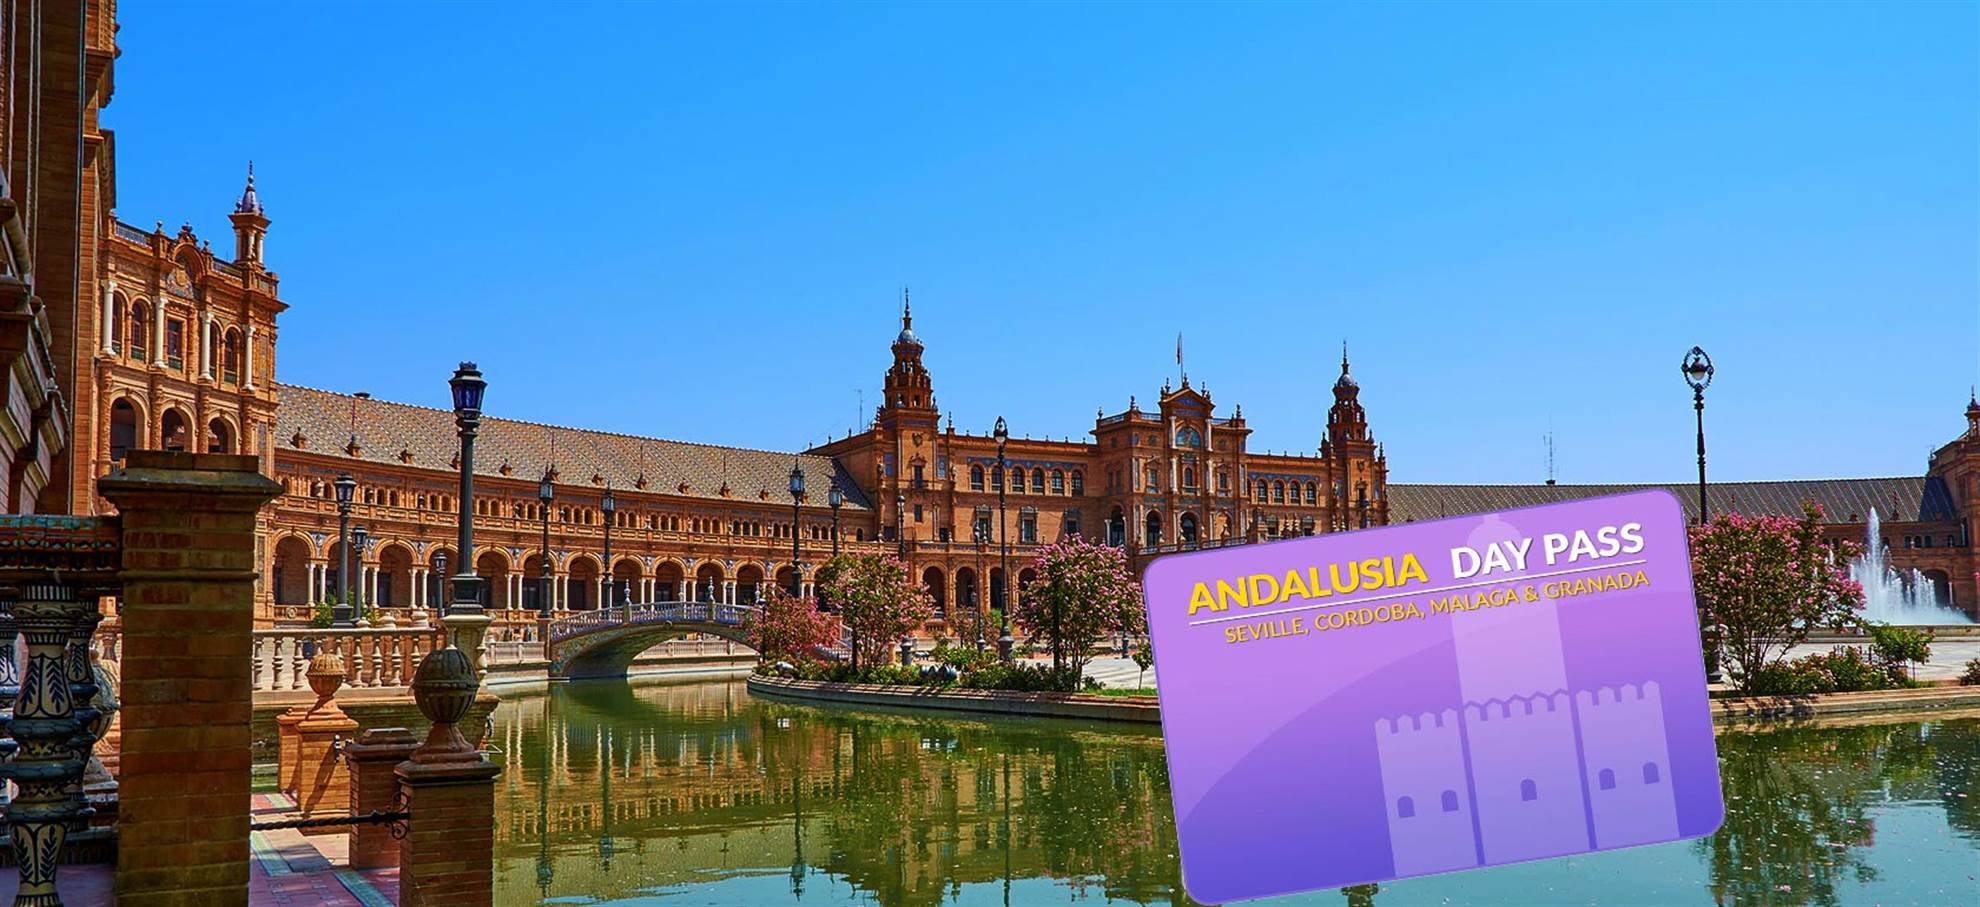 Andalusien-Tageskarte nach Sevilla / Cordoba / Malaga / Granada